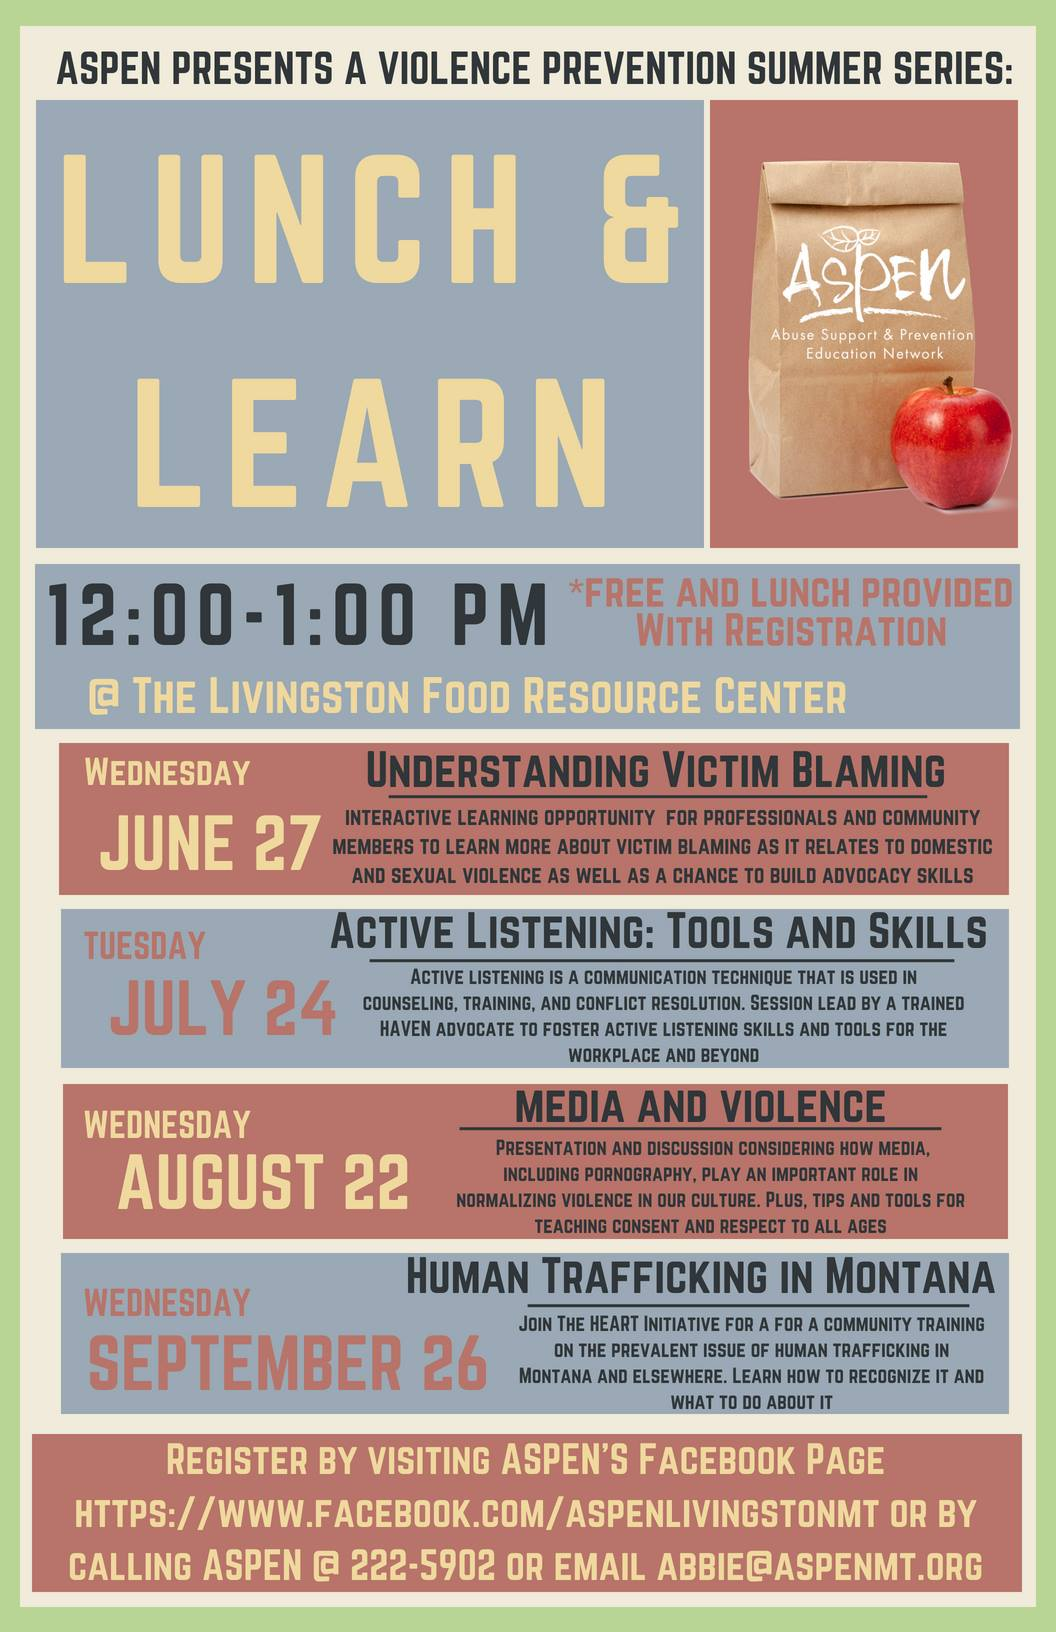 ASPEN's Lunch & Learn #1: Understanding Victim Blaming